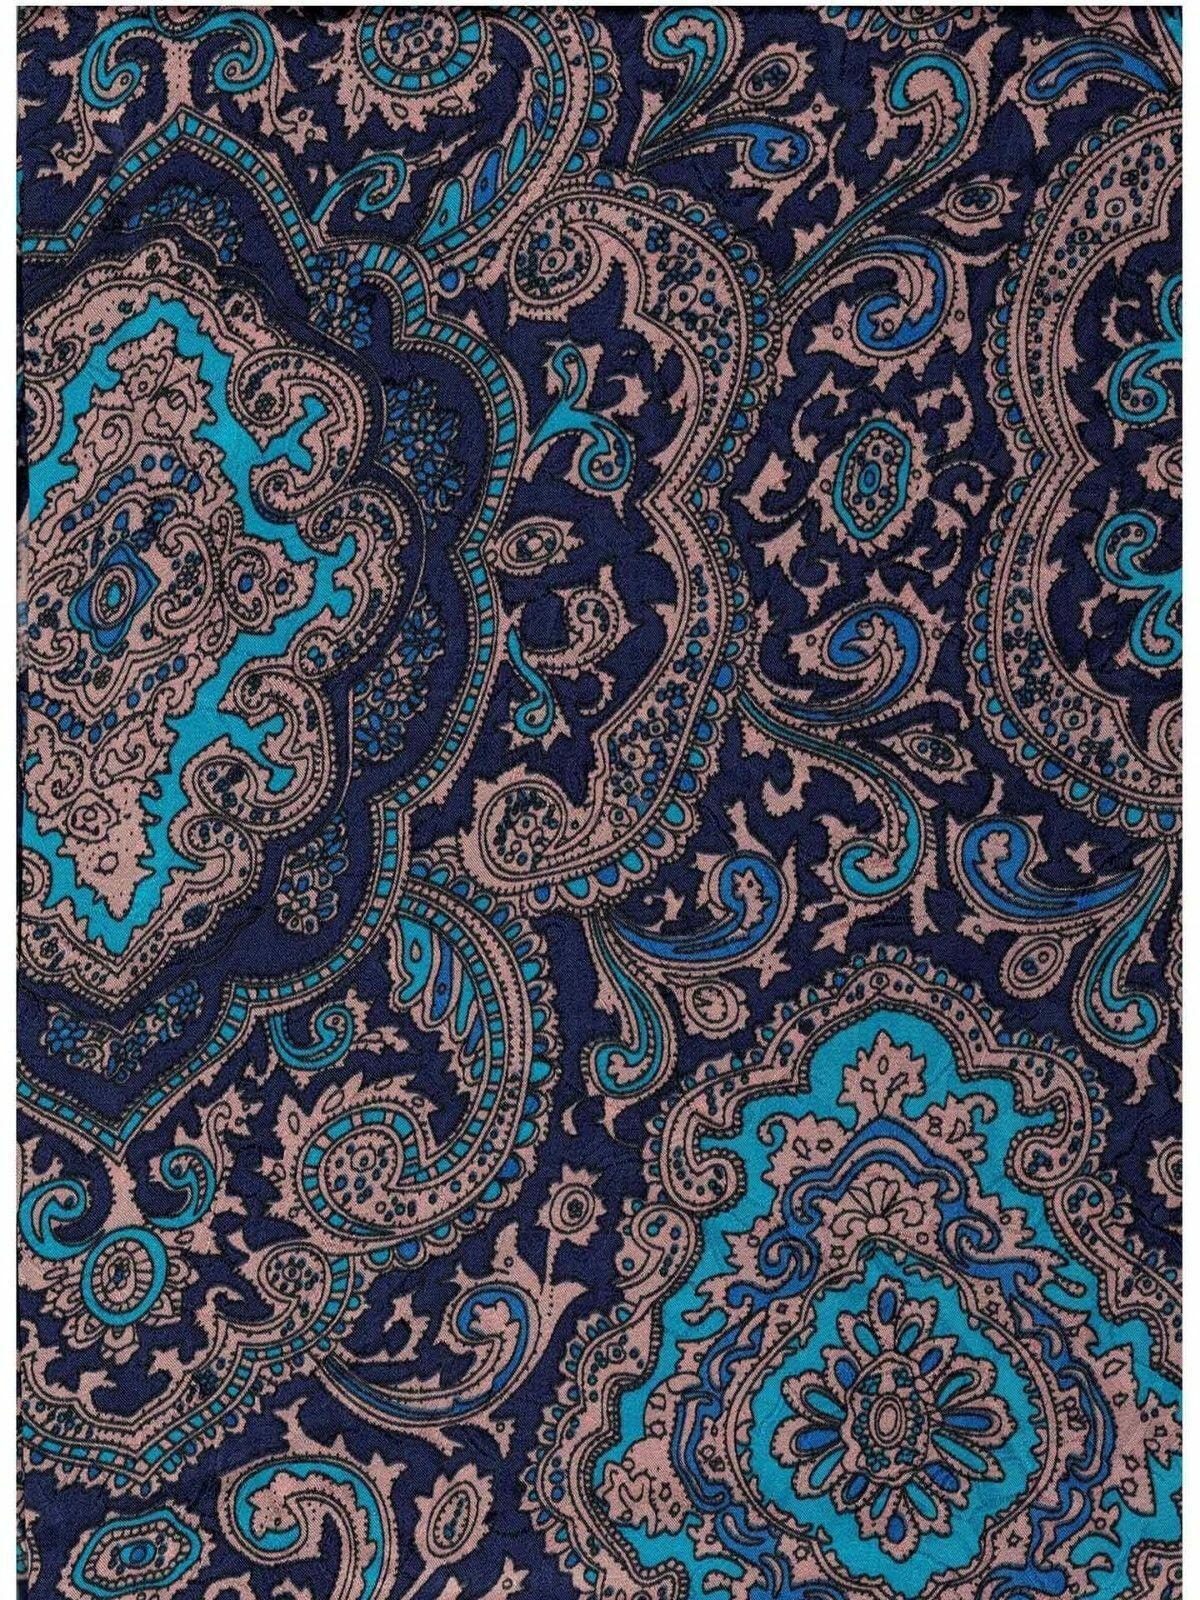 XL 42  Inch Paisley bluee gold Silk Wild Rags  order online